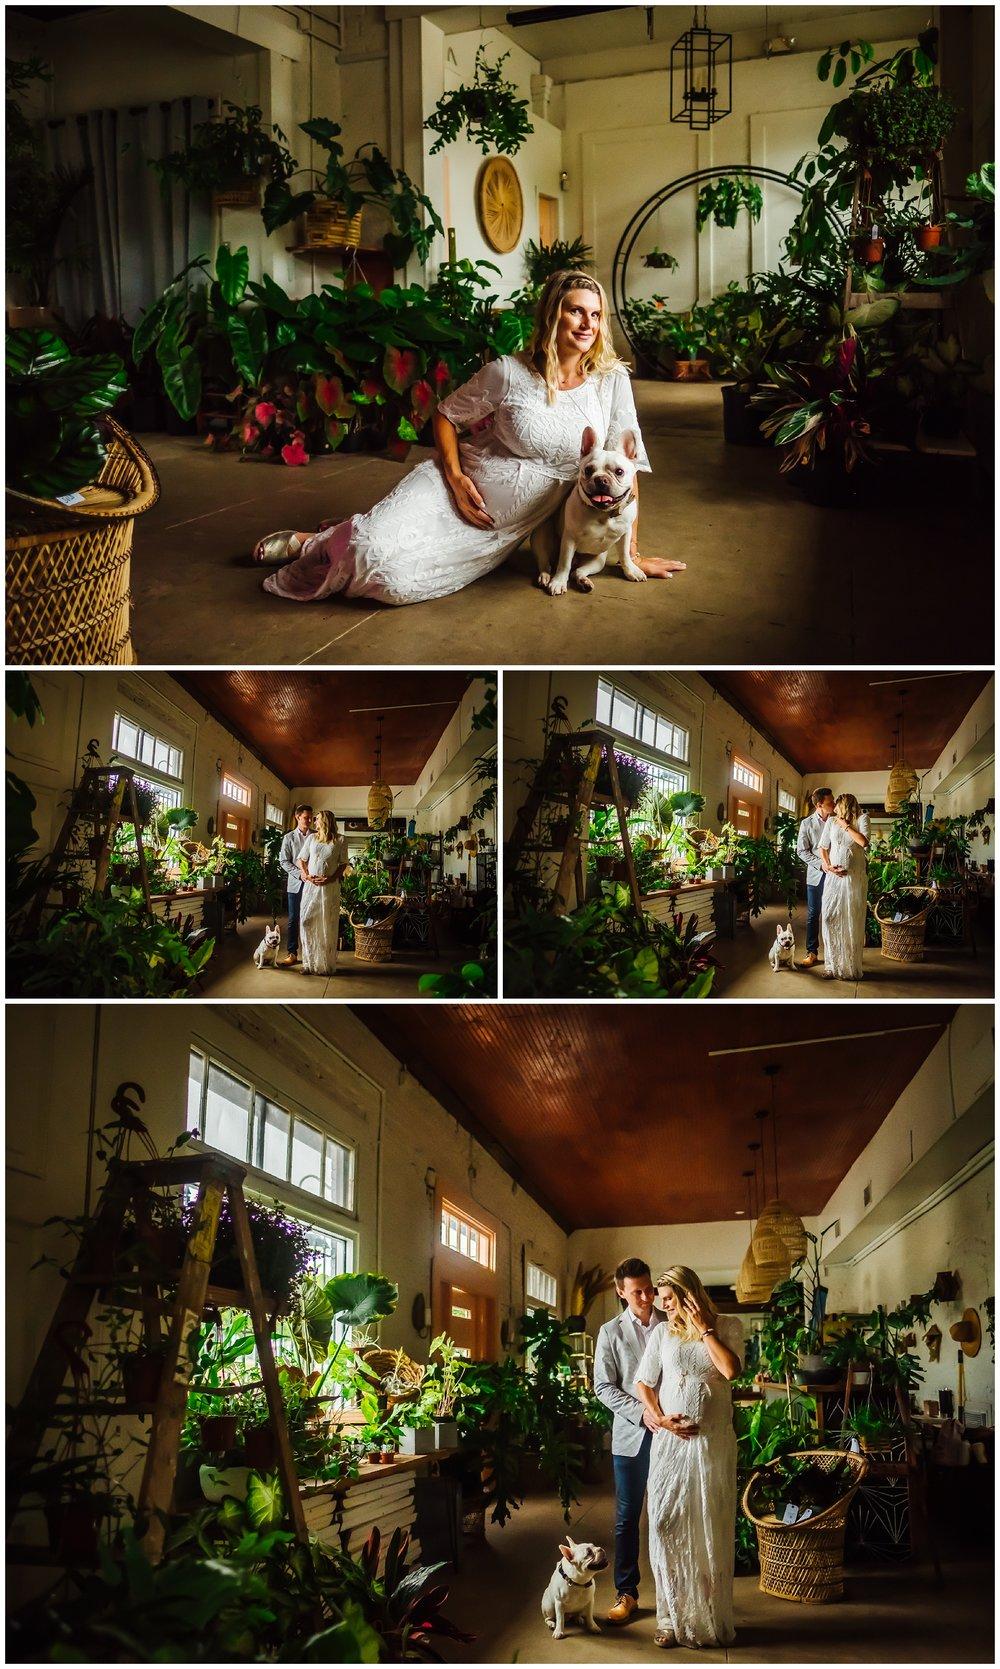 fancy-free-nursery-maternity-portraits-rainy-french-bulldog-boho-photographer-tampa_0068.jpg